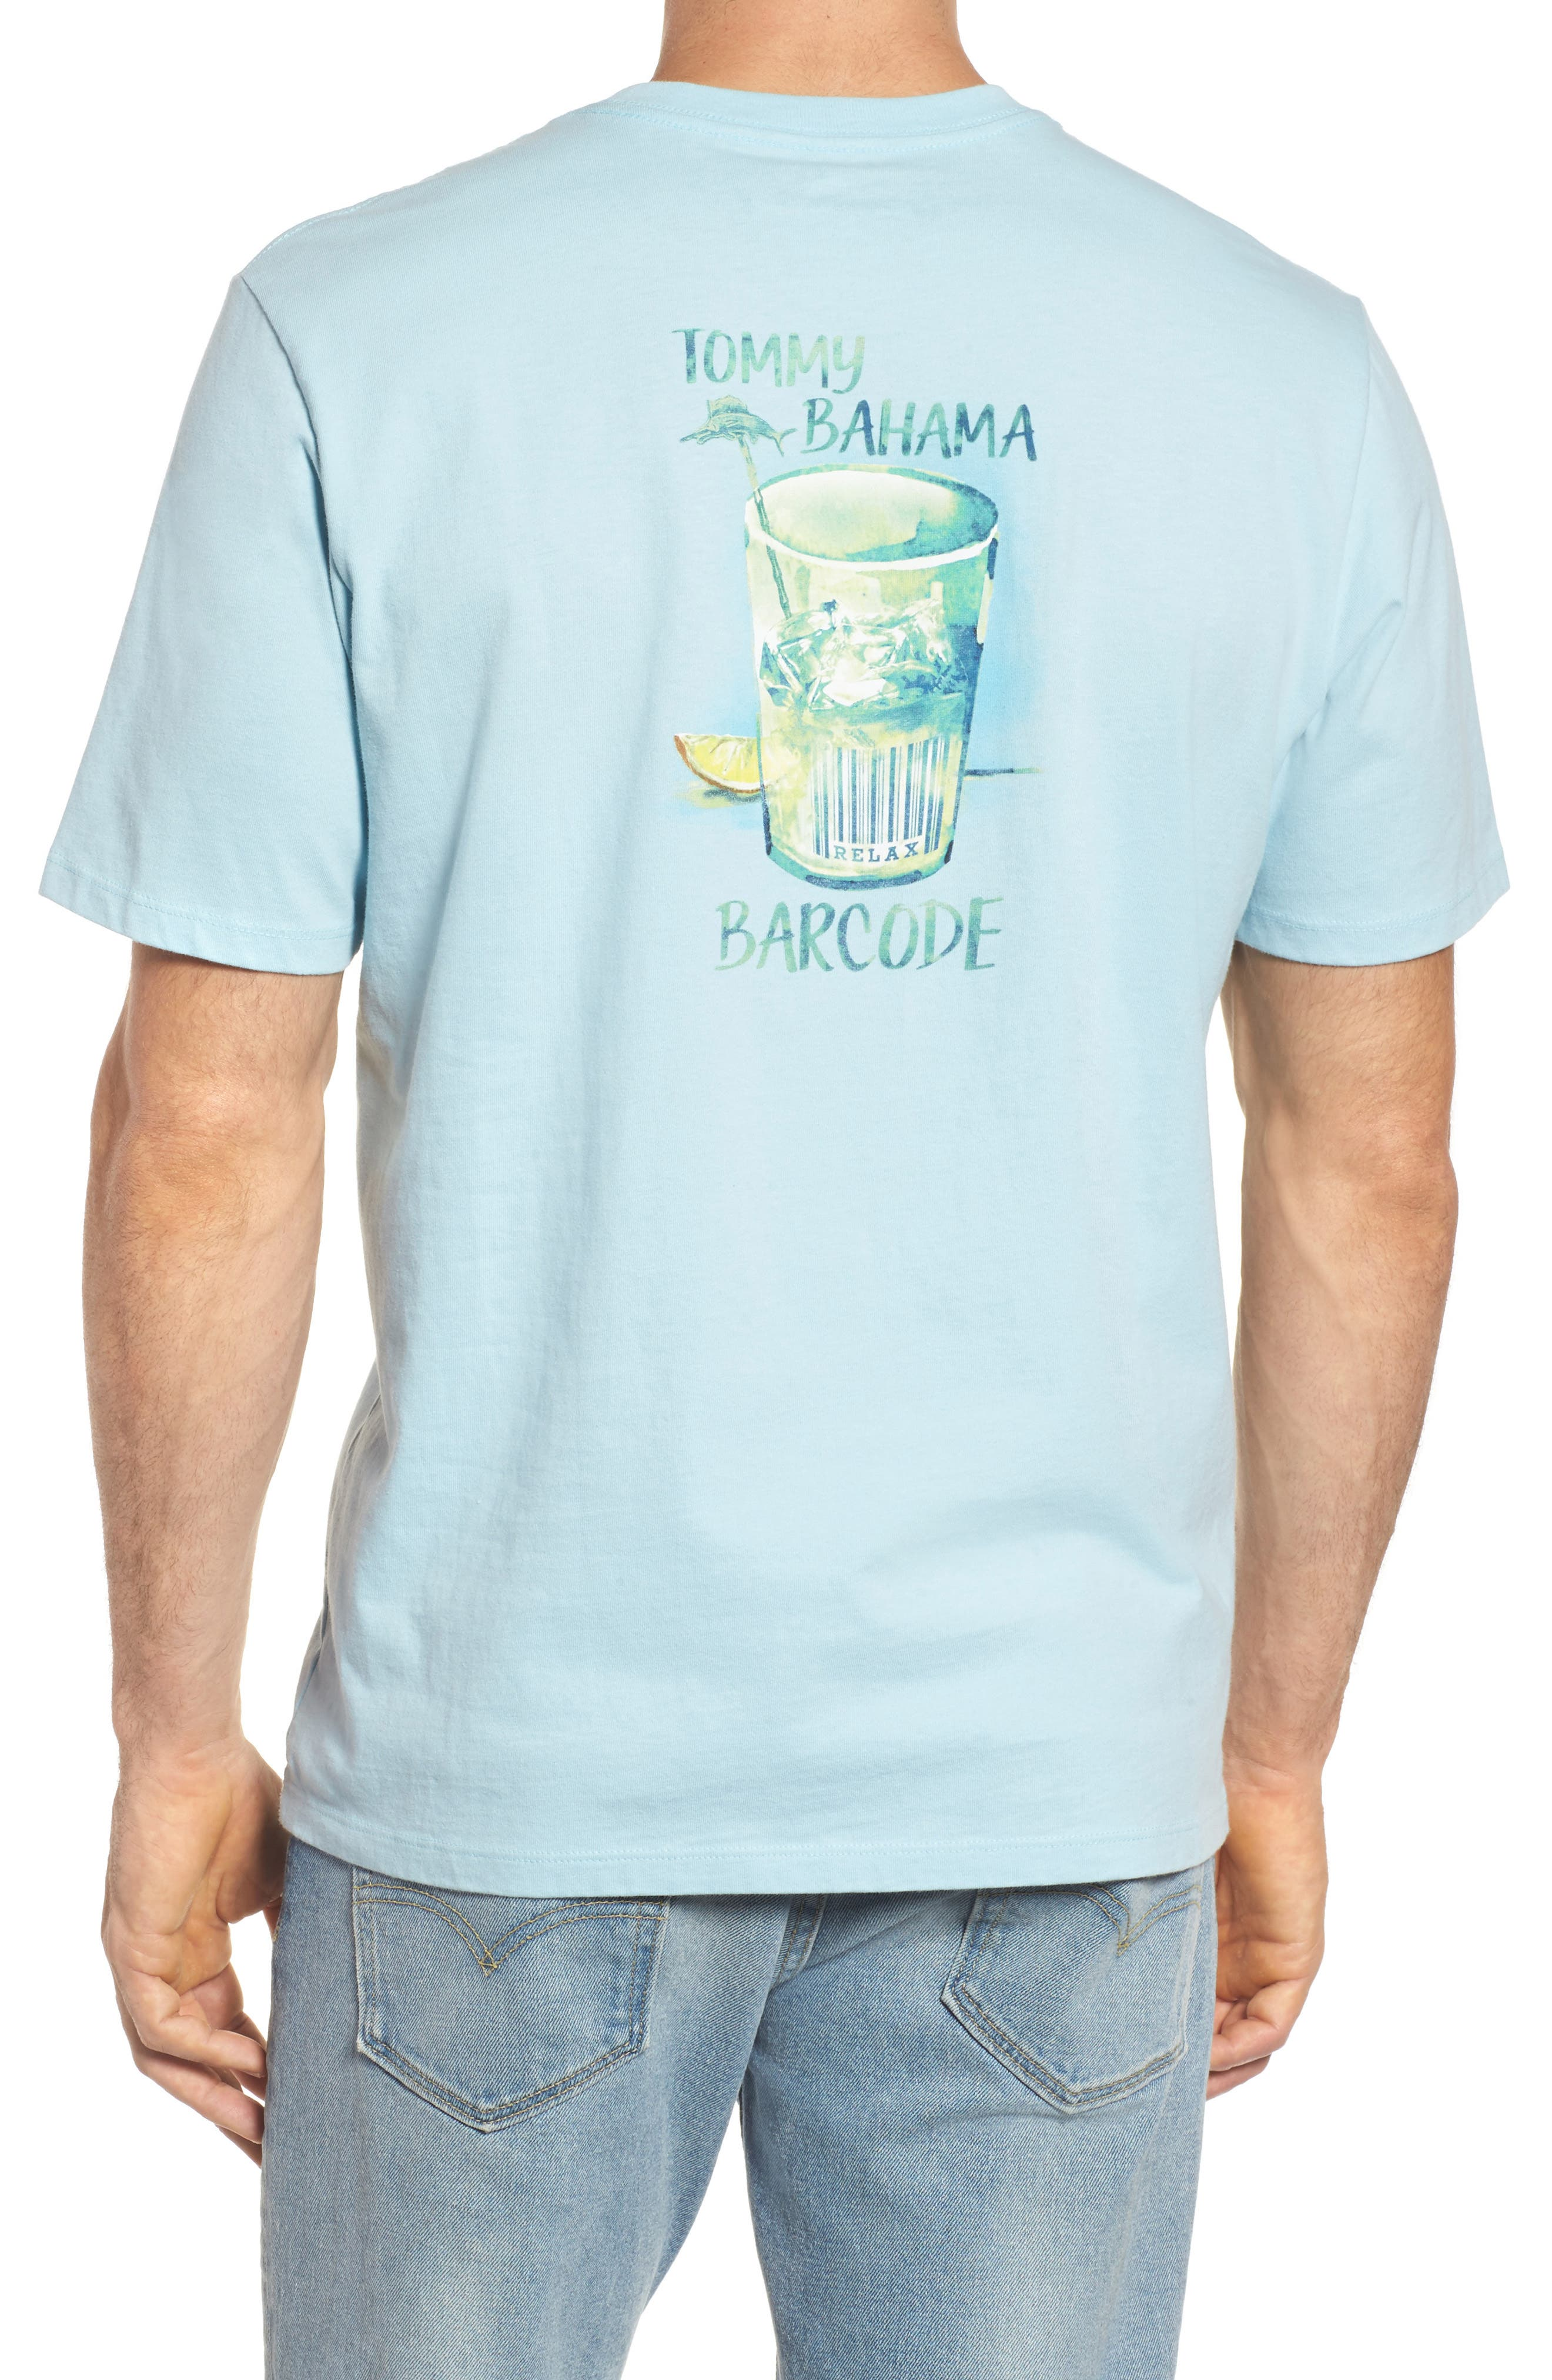 Main Image - Tommy Bahama Barcode Graphic T-Shirt